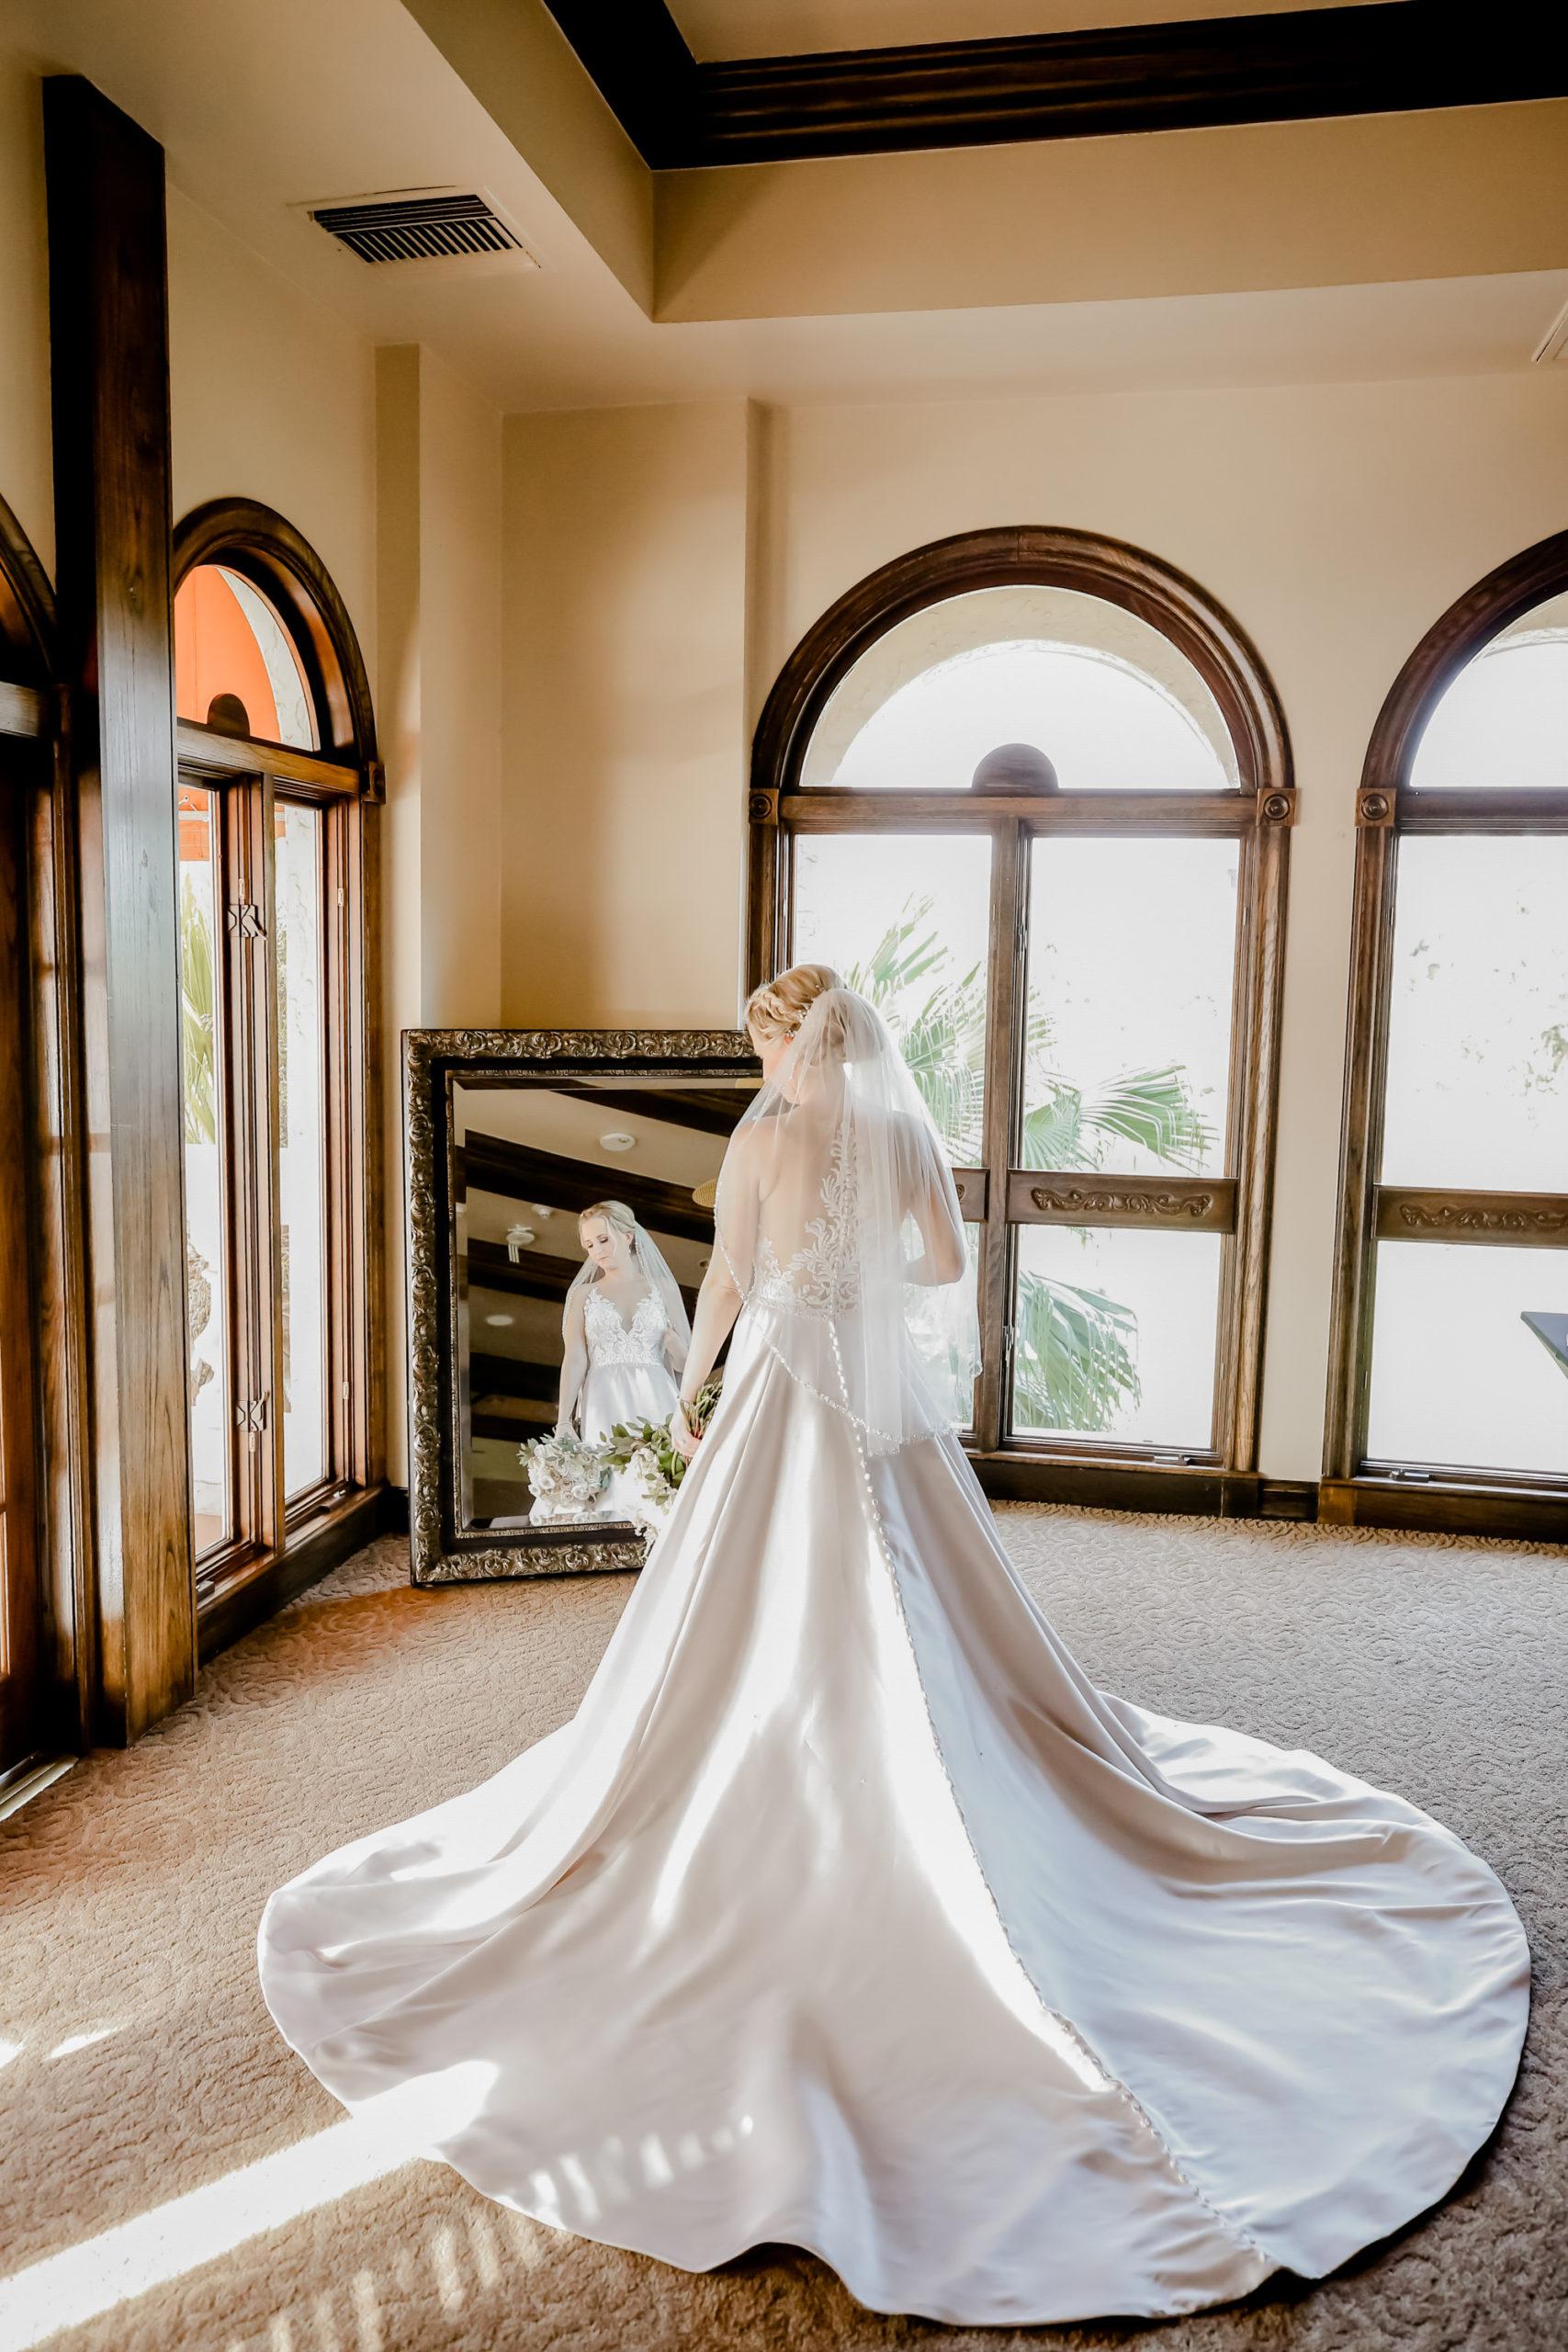 White Allure Ballgown Wedding Dress with Long Train | Tampa Bay Wedding Photographer Lifelong Photography Studio